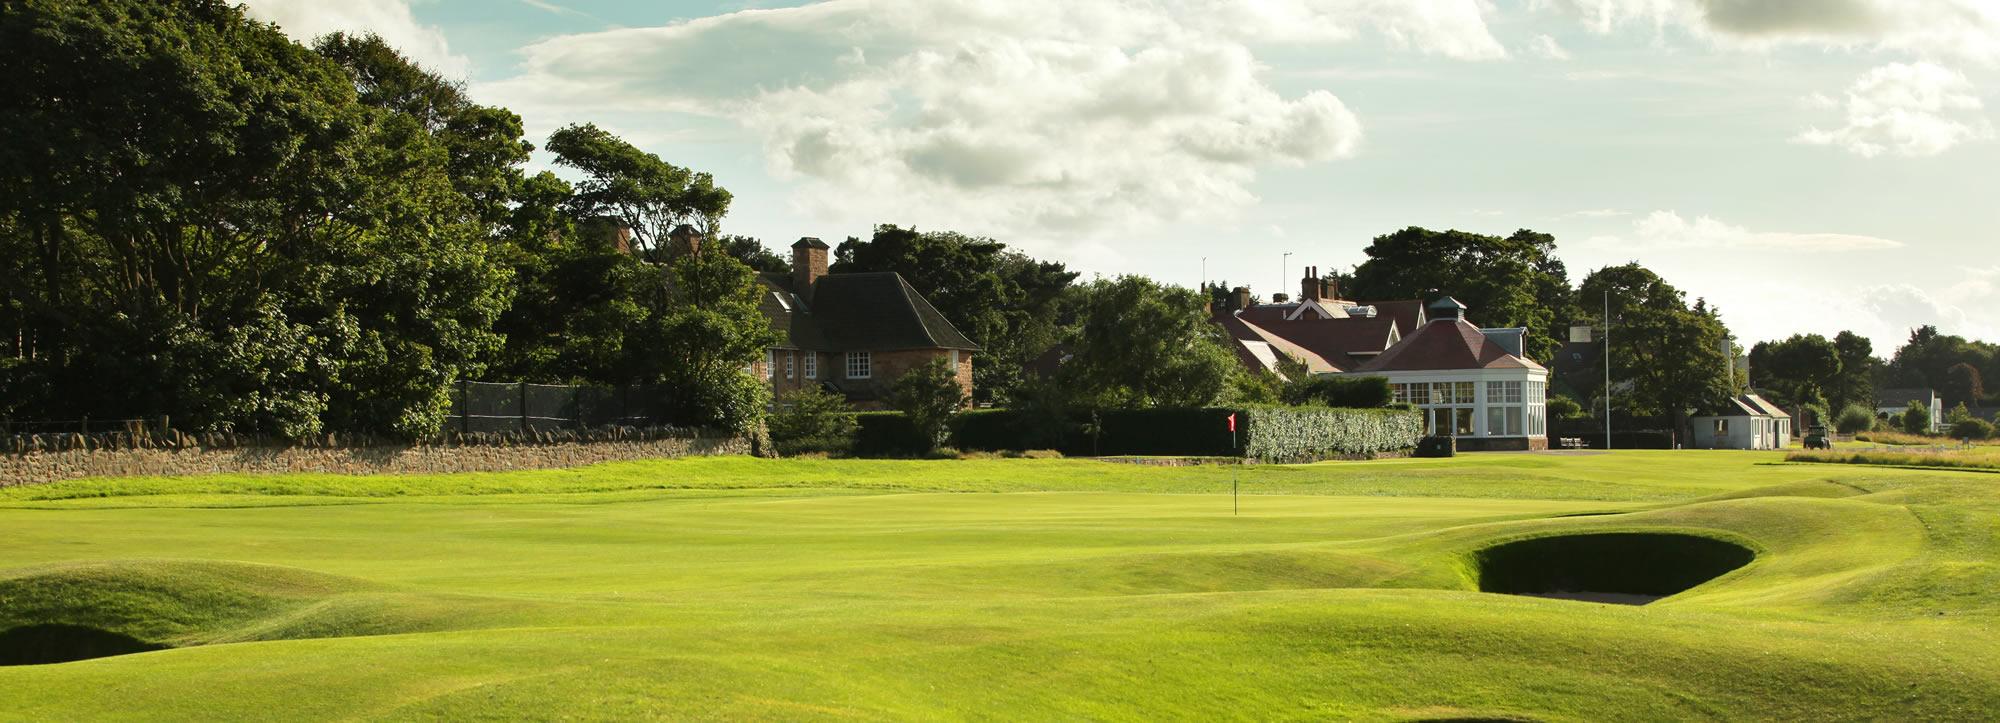 Muirfield 9th Green